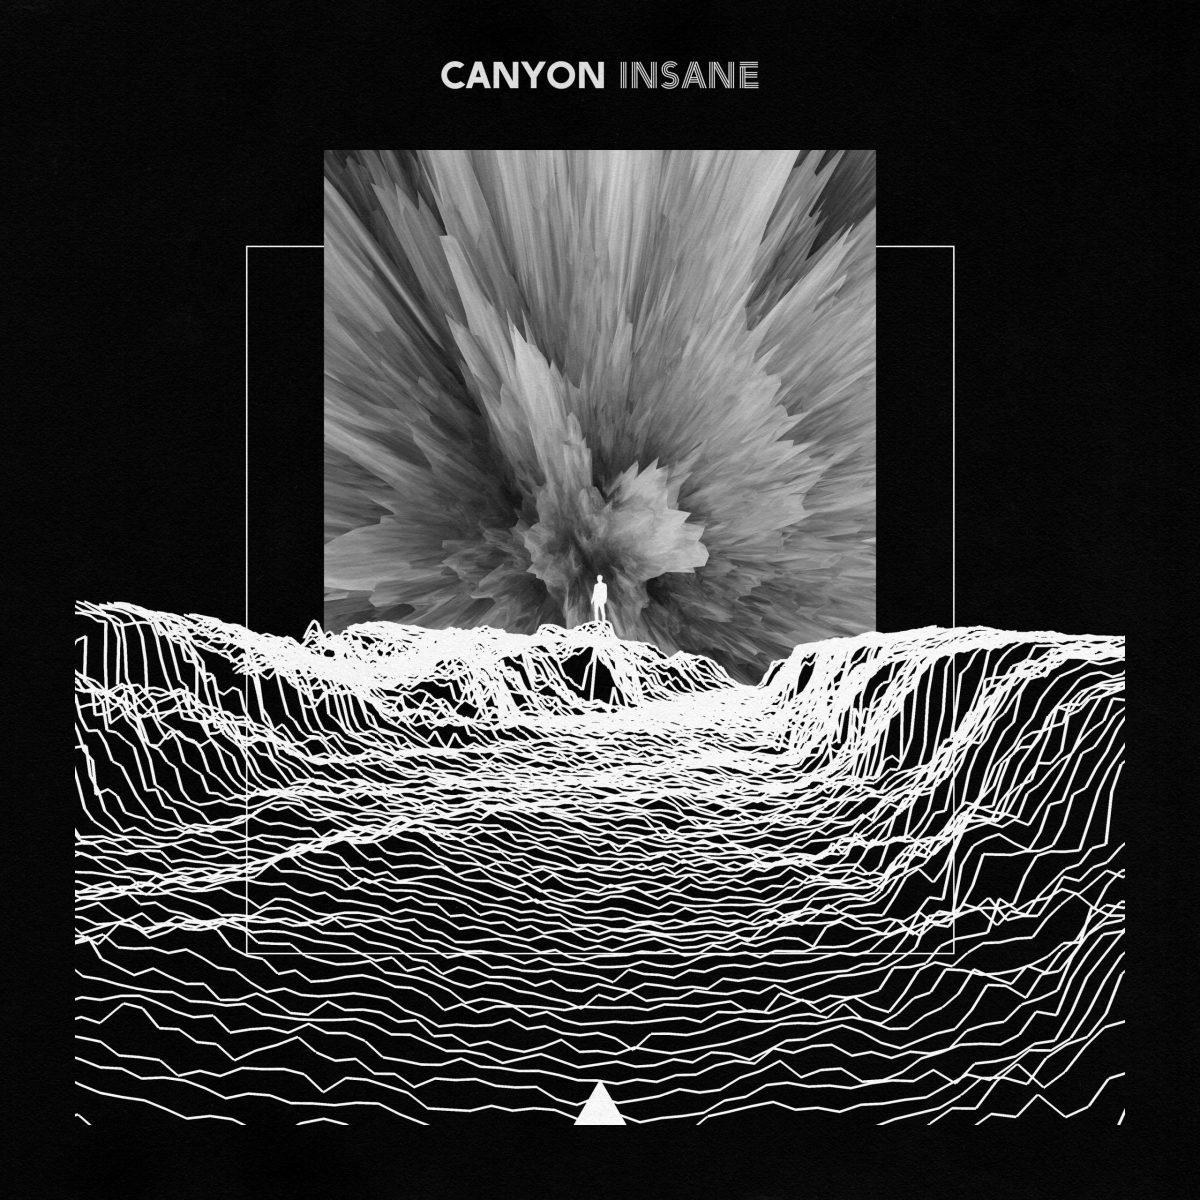 canyon-insane-bandvorstellung-neue-single